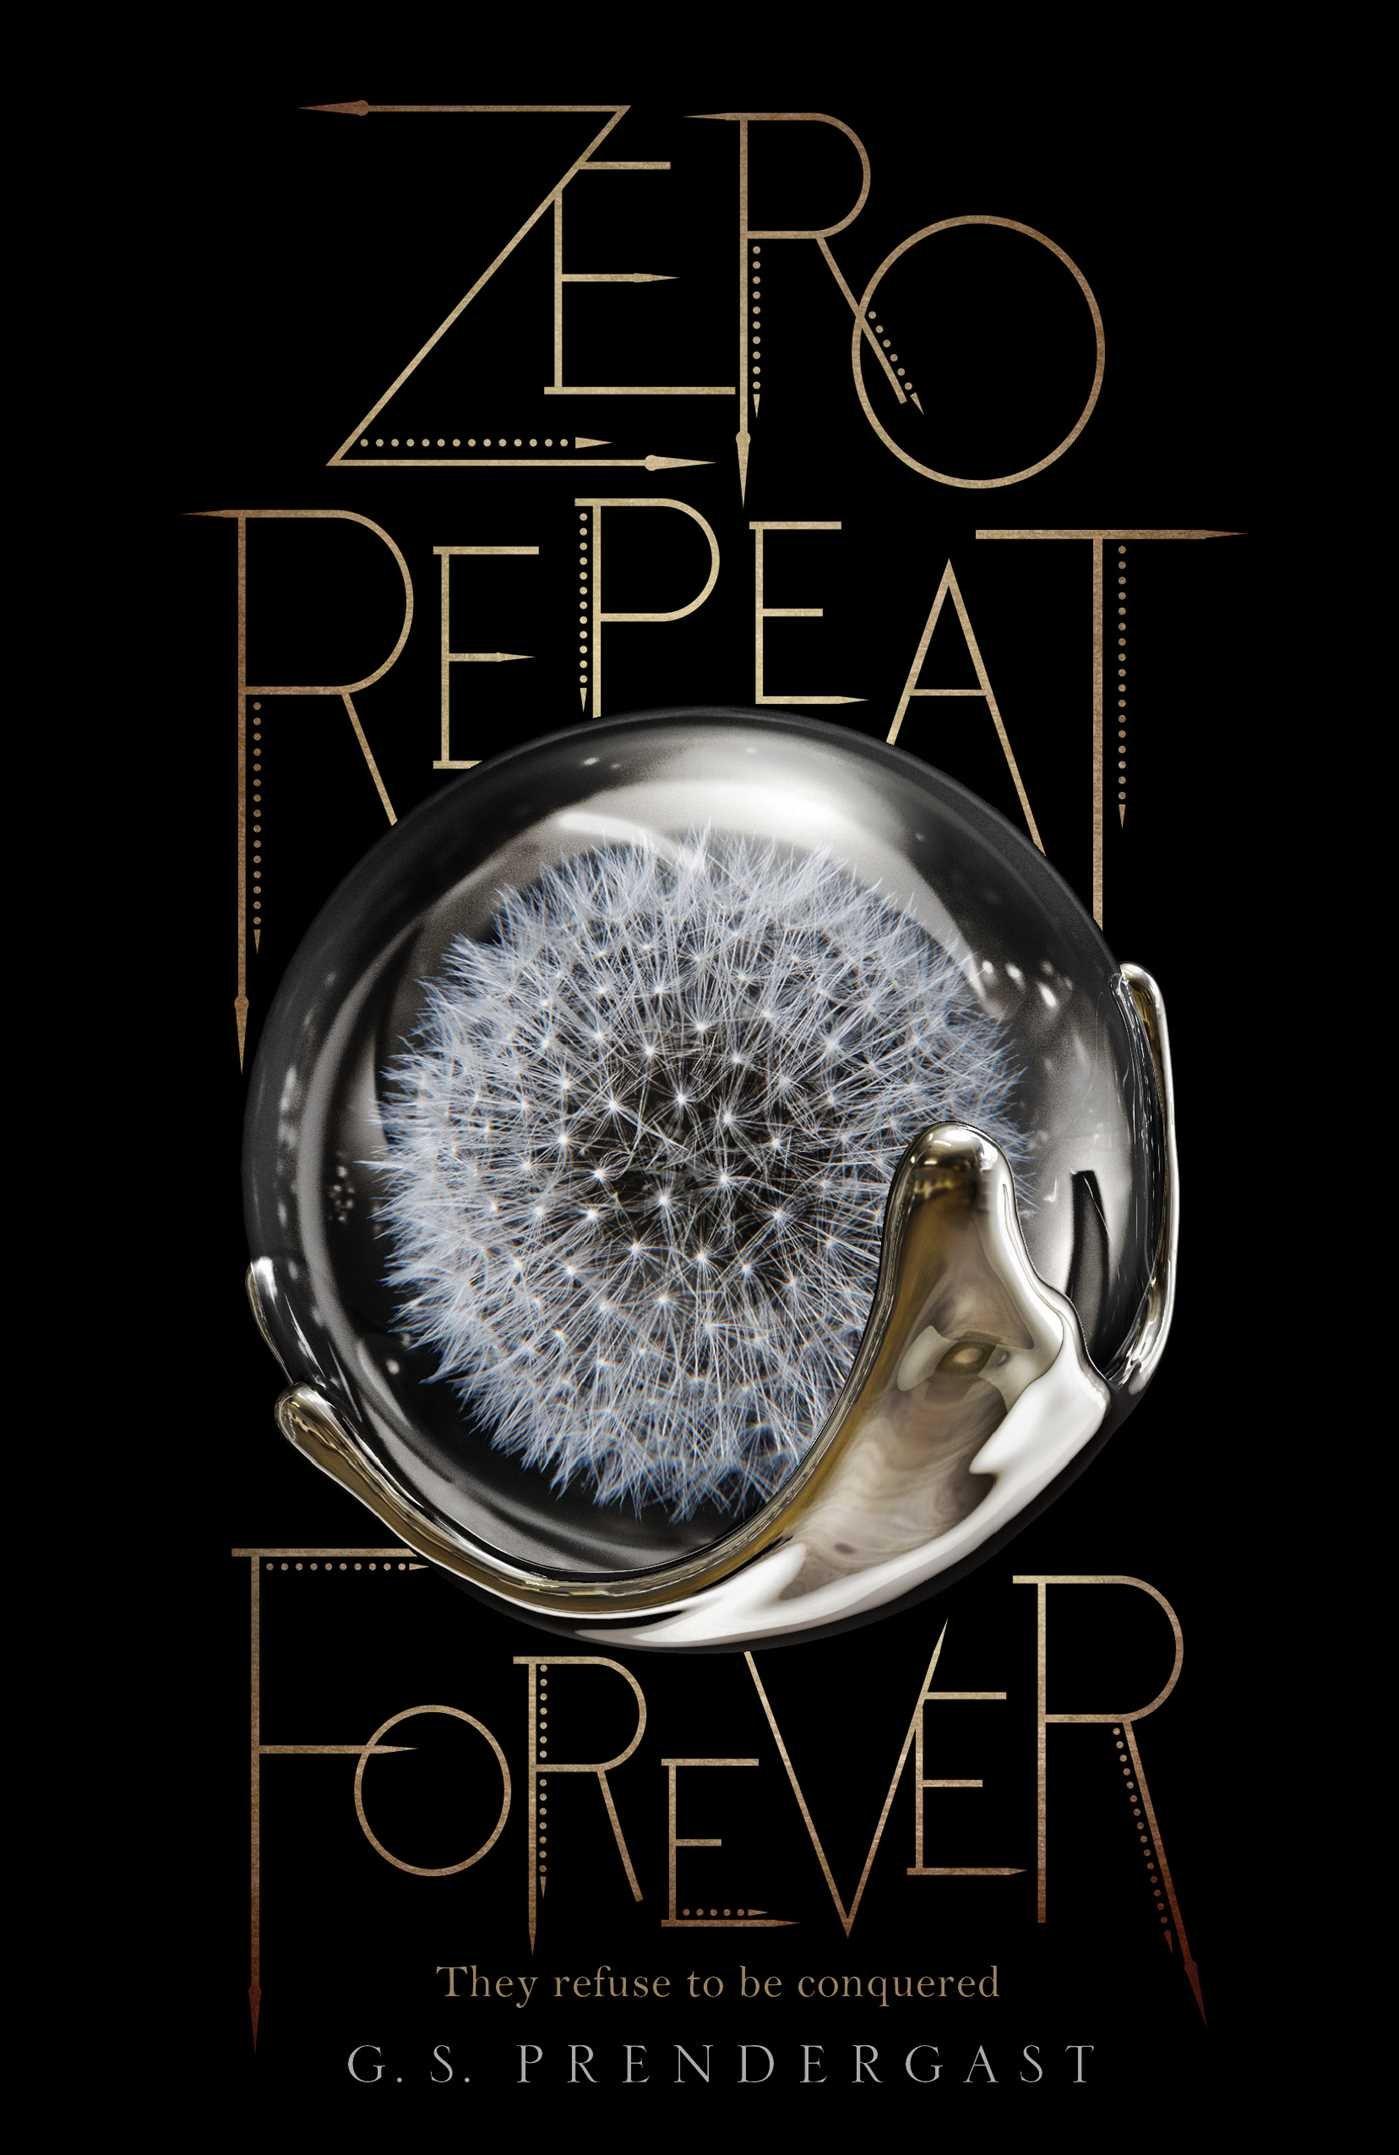 zero repeat forever.jpg